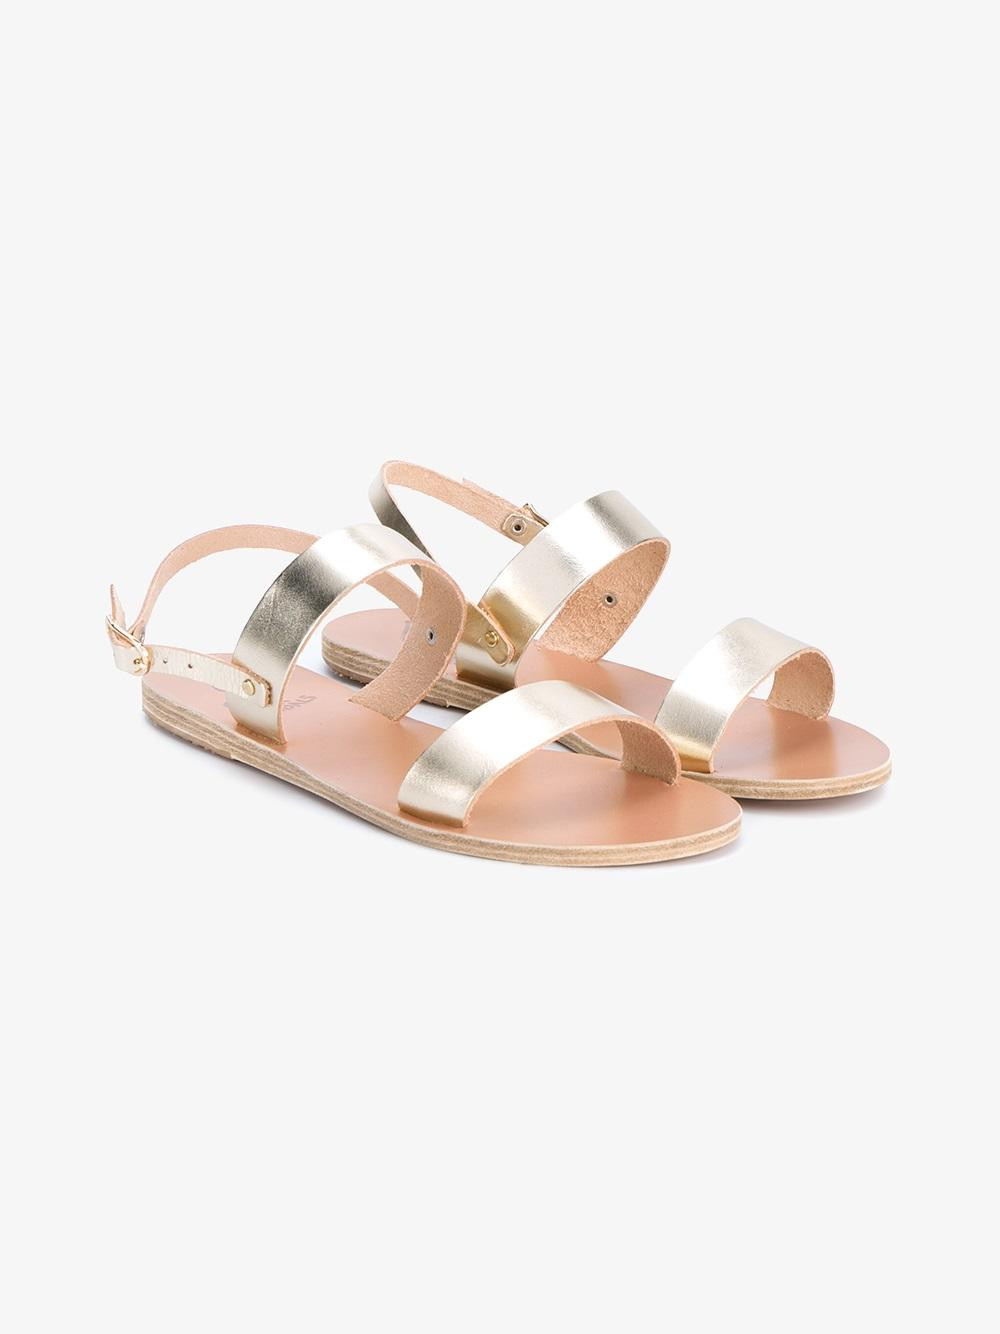 Ancient Greek Sandals 'Clio' metallic leather sandals